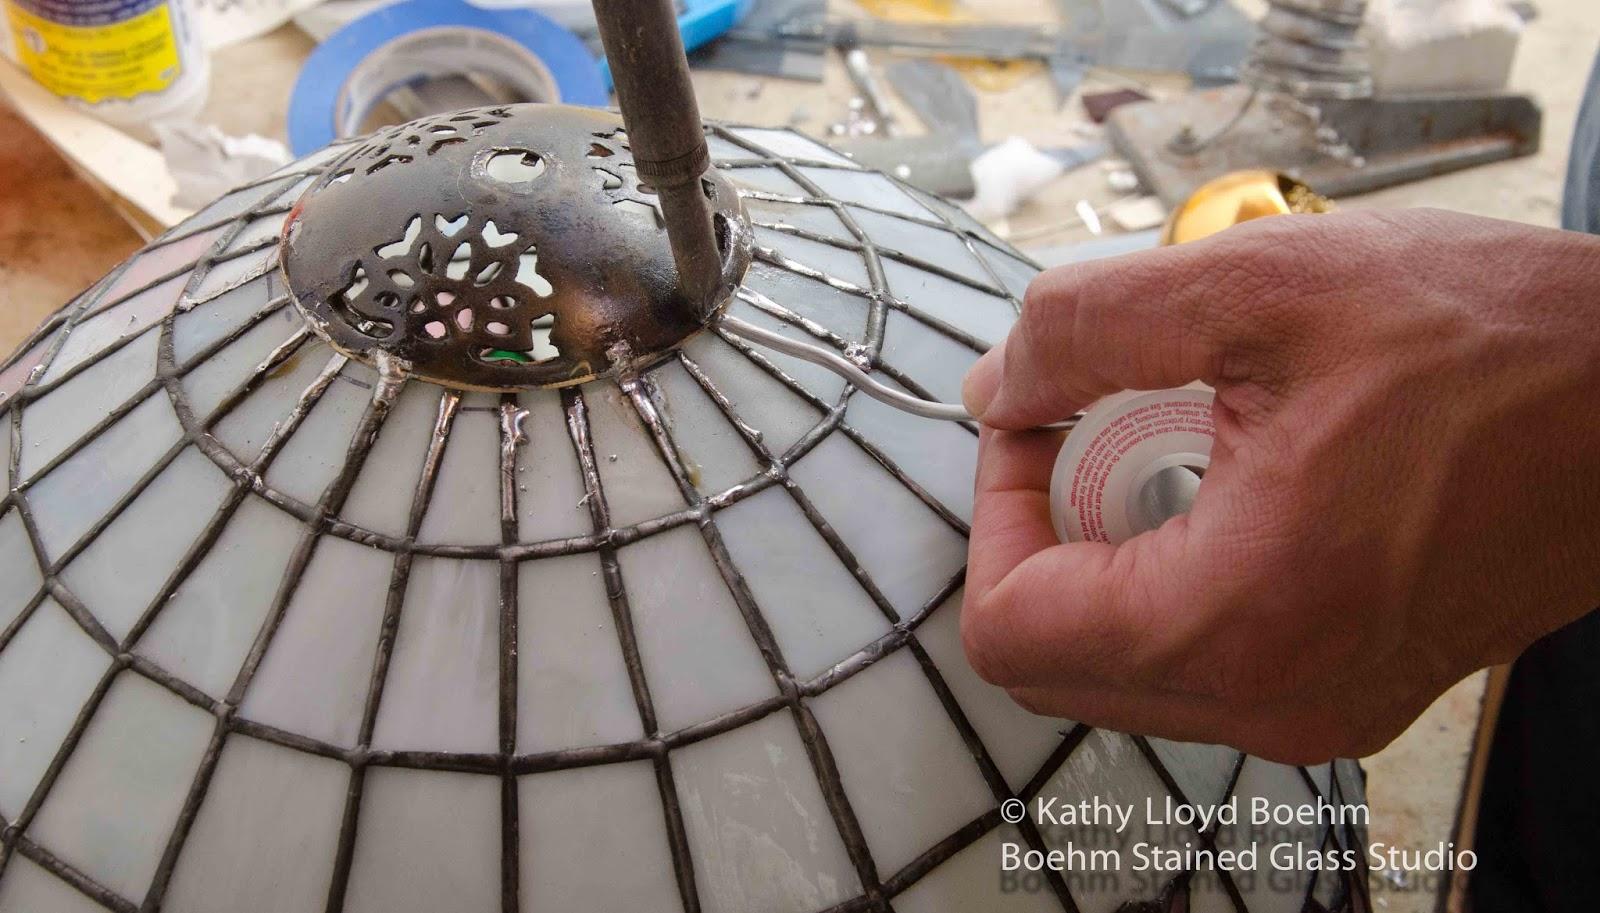 Boehm Stained Glass Blog: Lamp Cap Repair